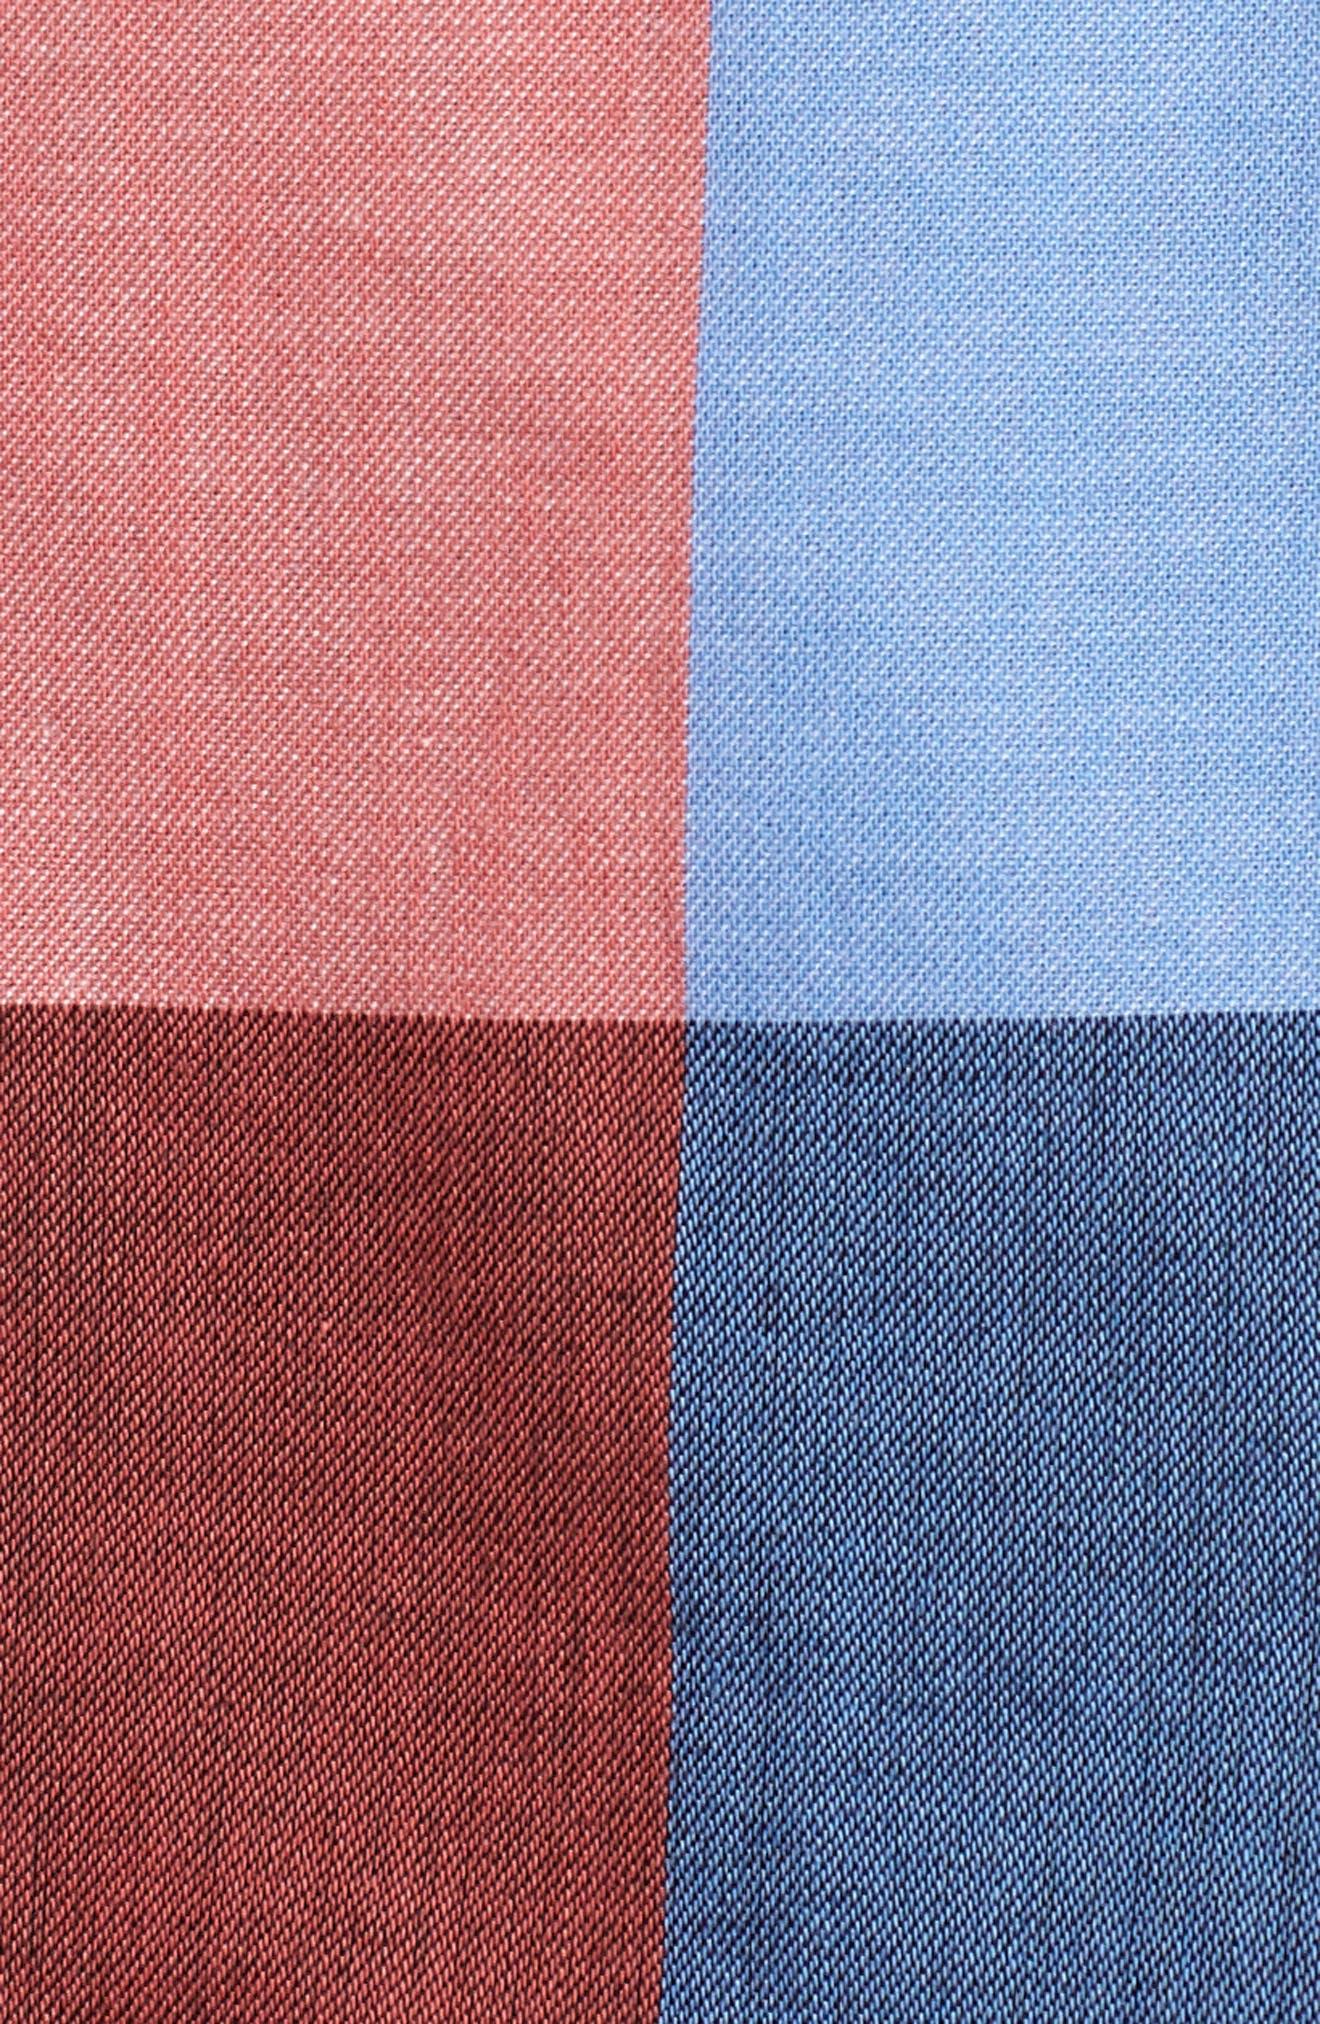 Double Breasted Plaid Cotton Blazer,                             Alternate thumbnail 7, color,                             650